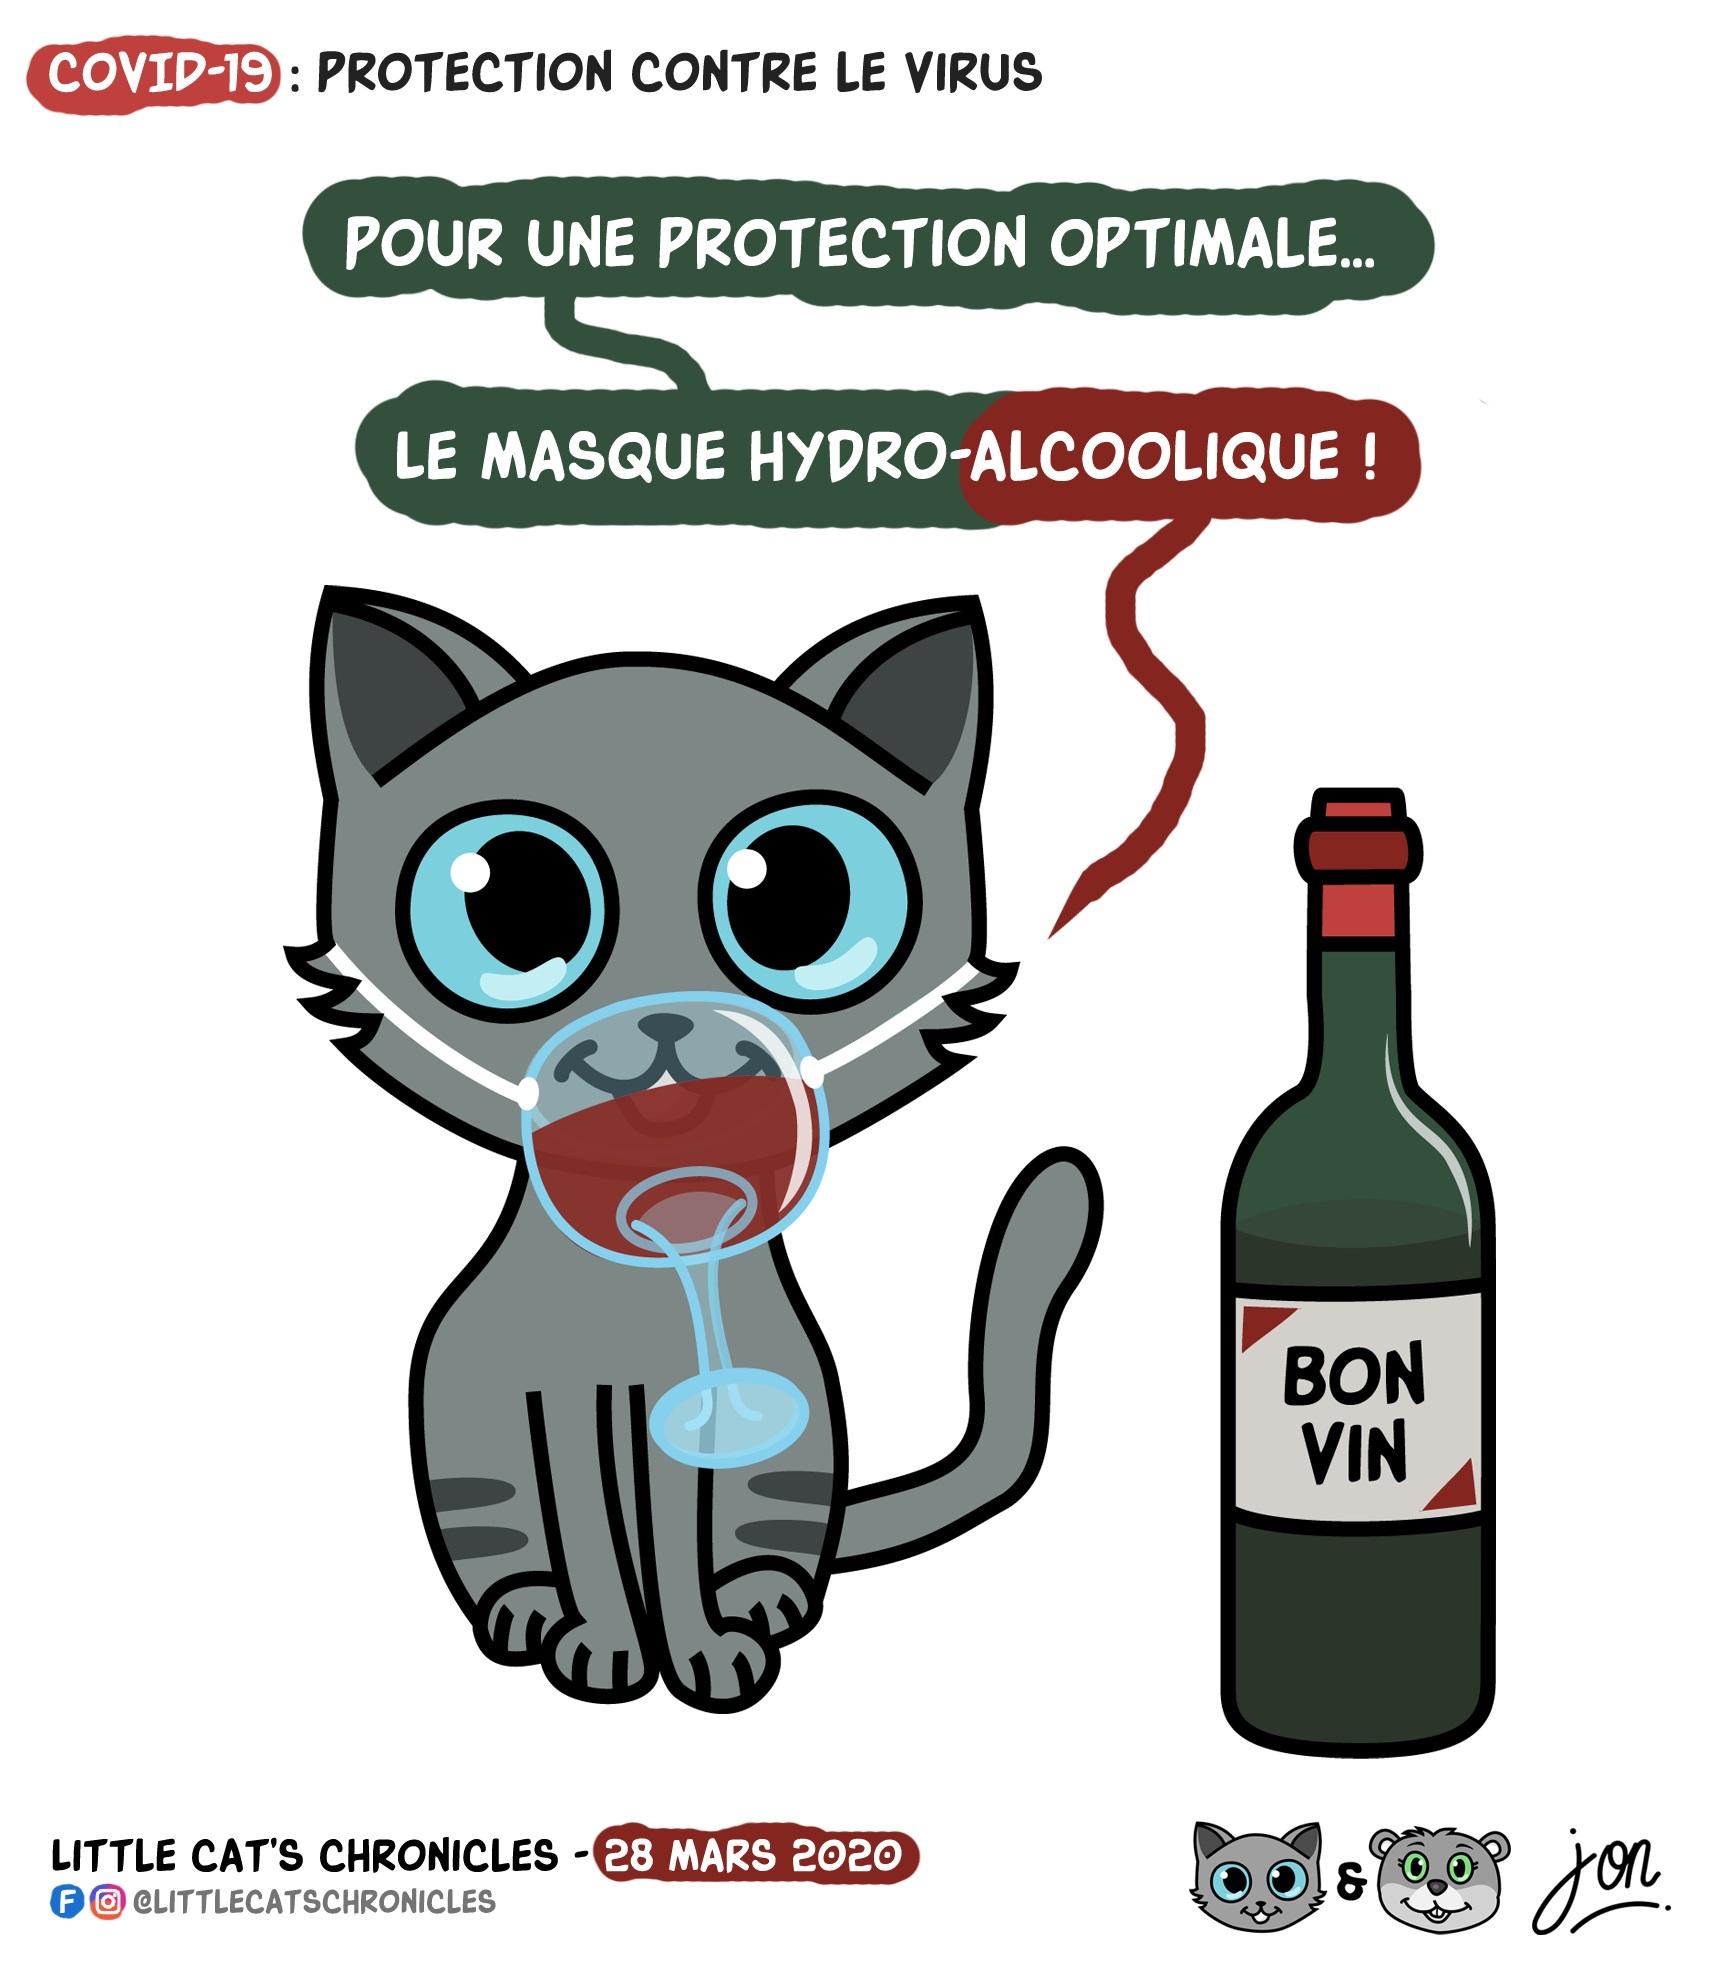 Ectac Grippe A Les Frabricants De Gel Antibacterien Se